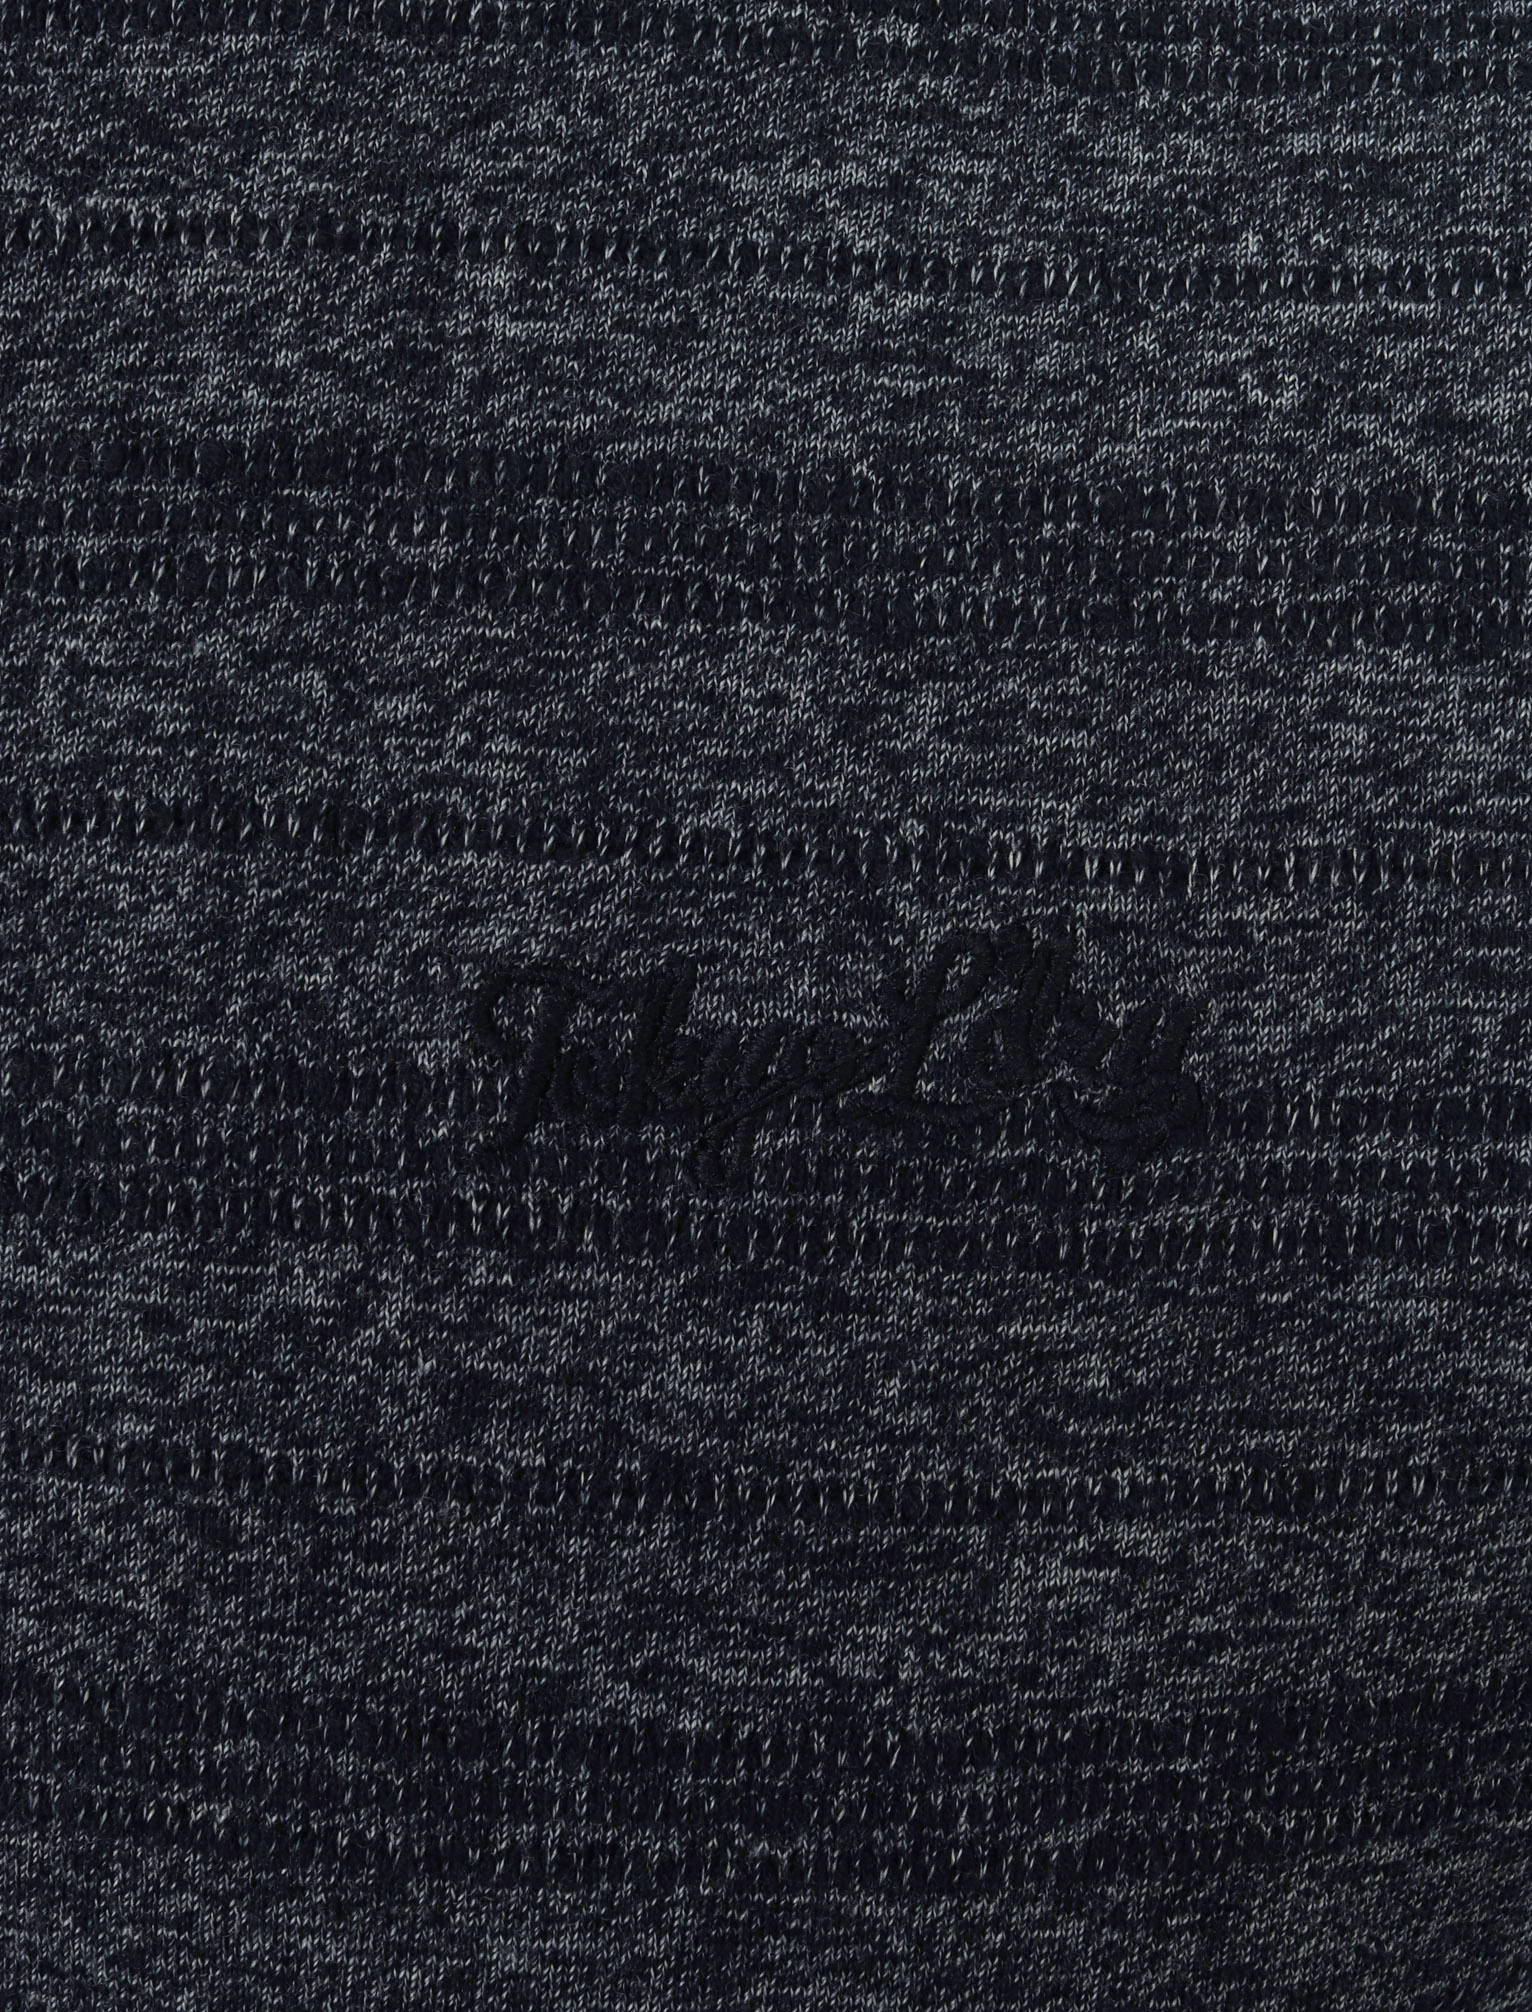 Tokyo-Laundry-Men-Hoaden-Crew-Neck-Long-Sleeve-T-Shirt-Top-Henley-Grandad-Collar thumbnail 6